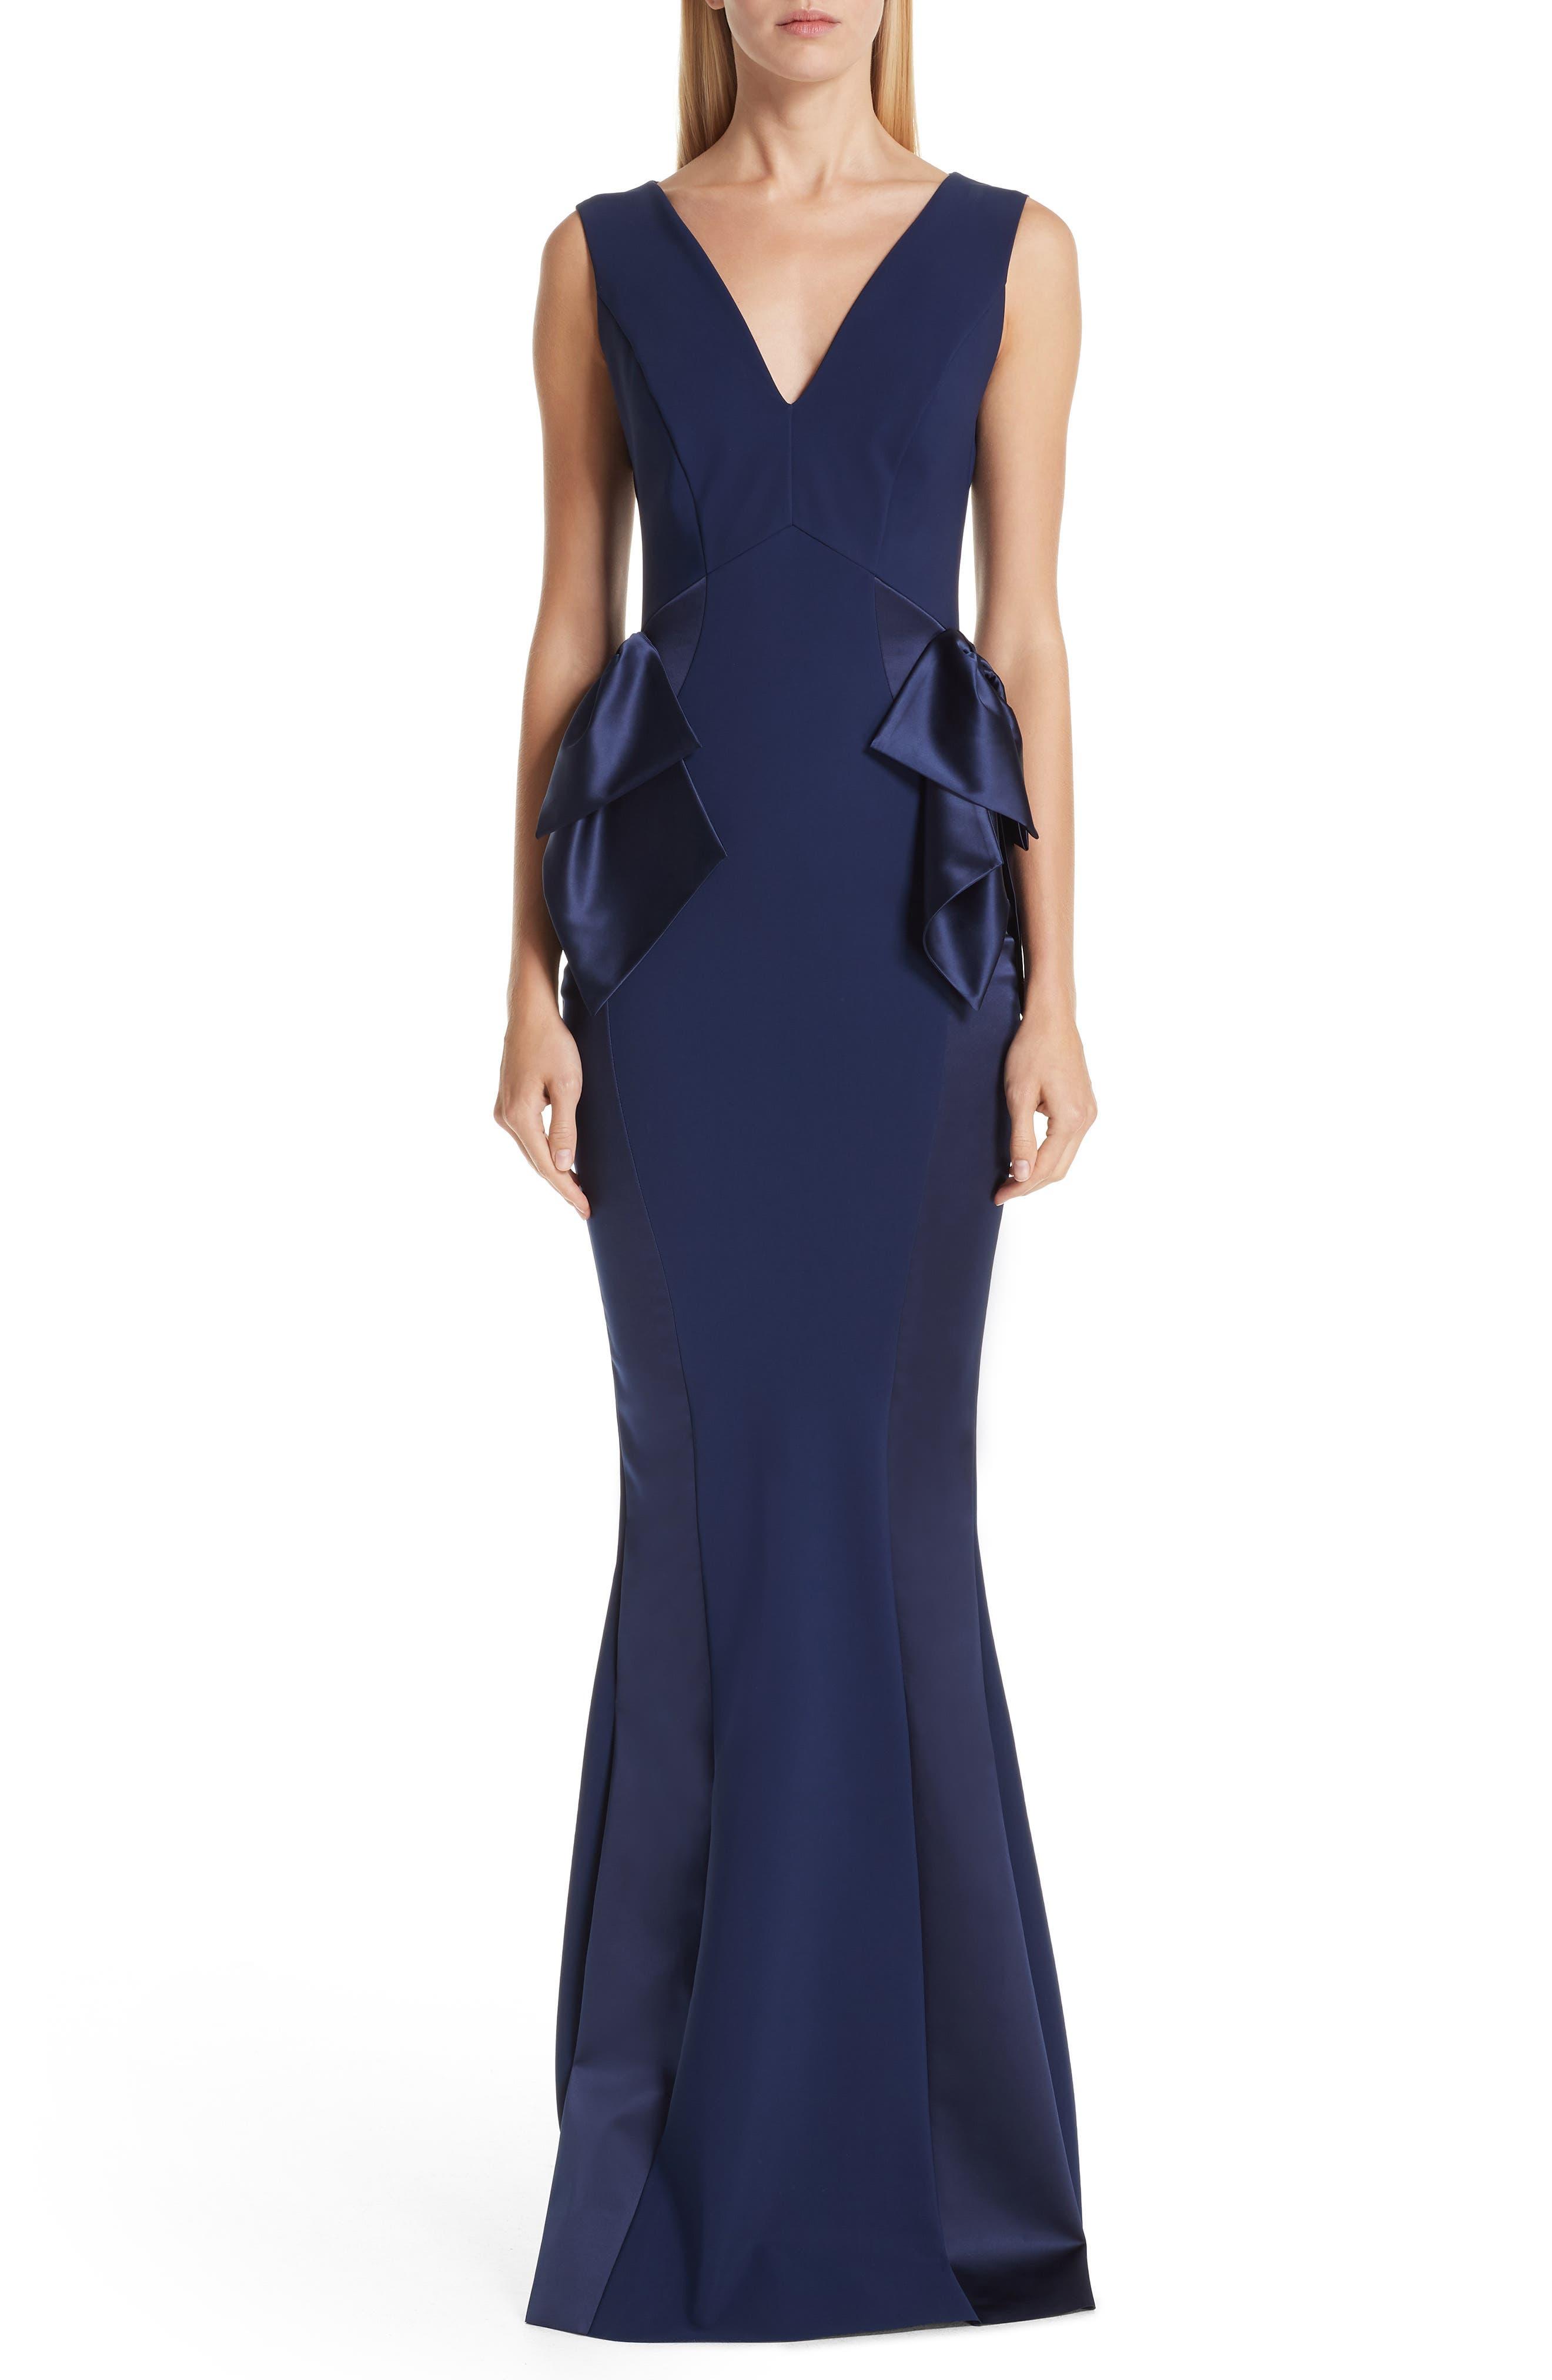 Chiara Boni La Petite Robe Macaria Satin Bow Trumpet Gown, 6 IT - Blue